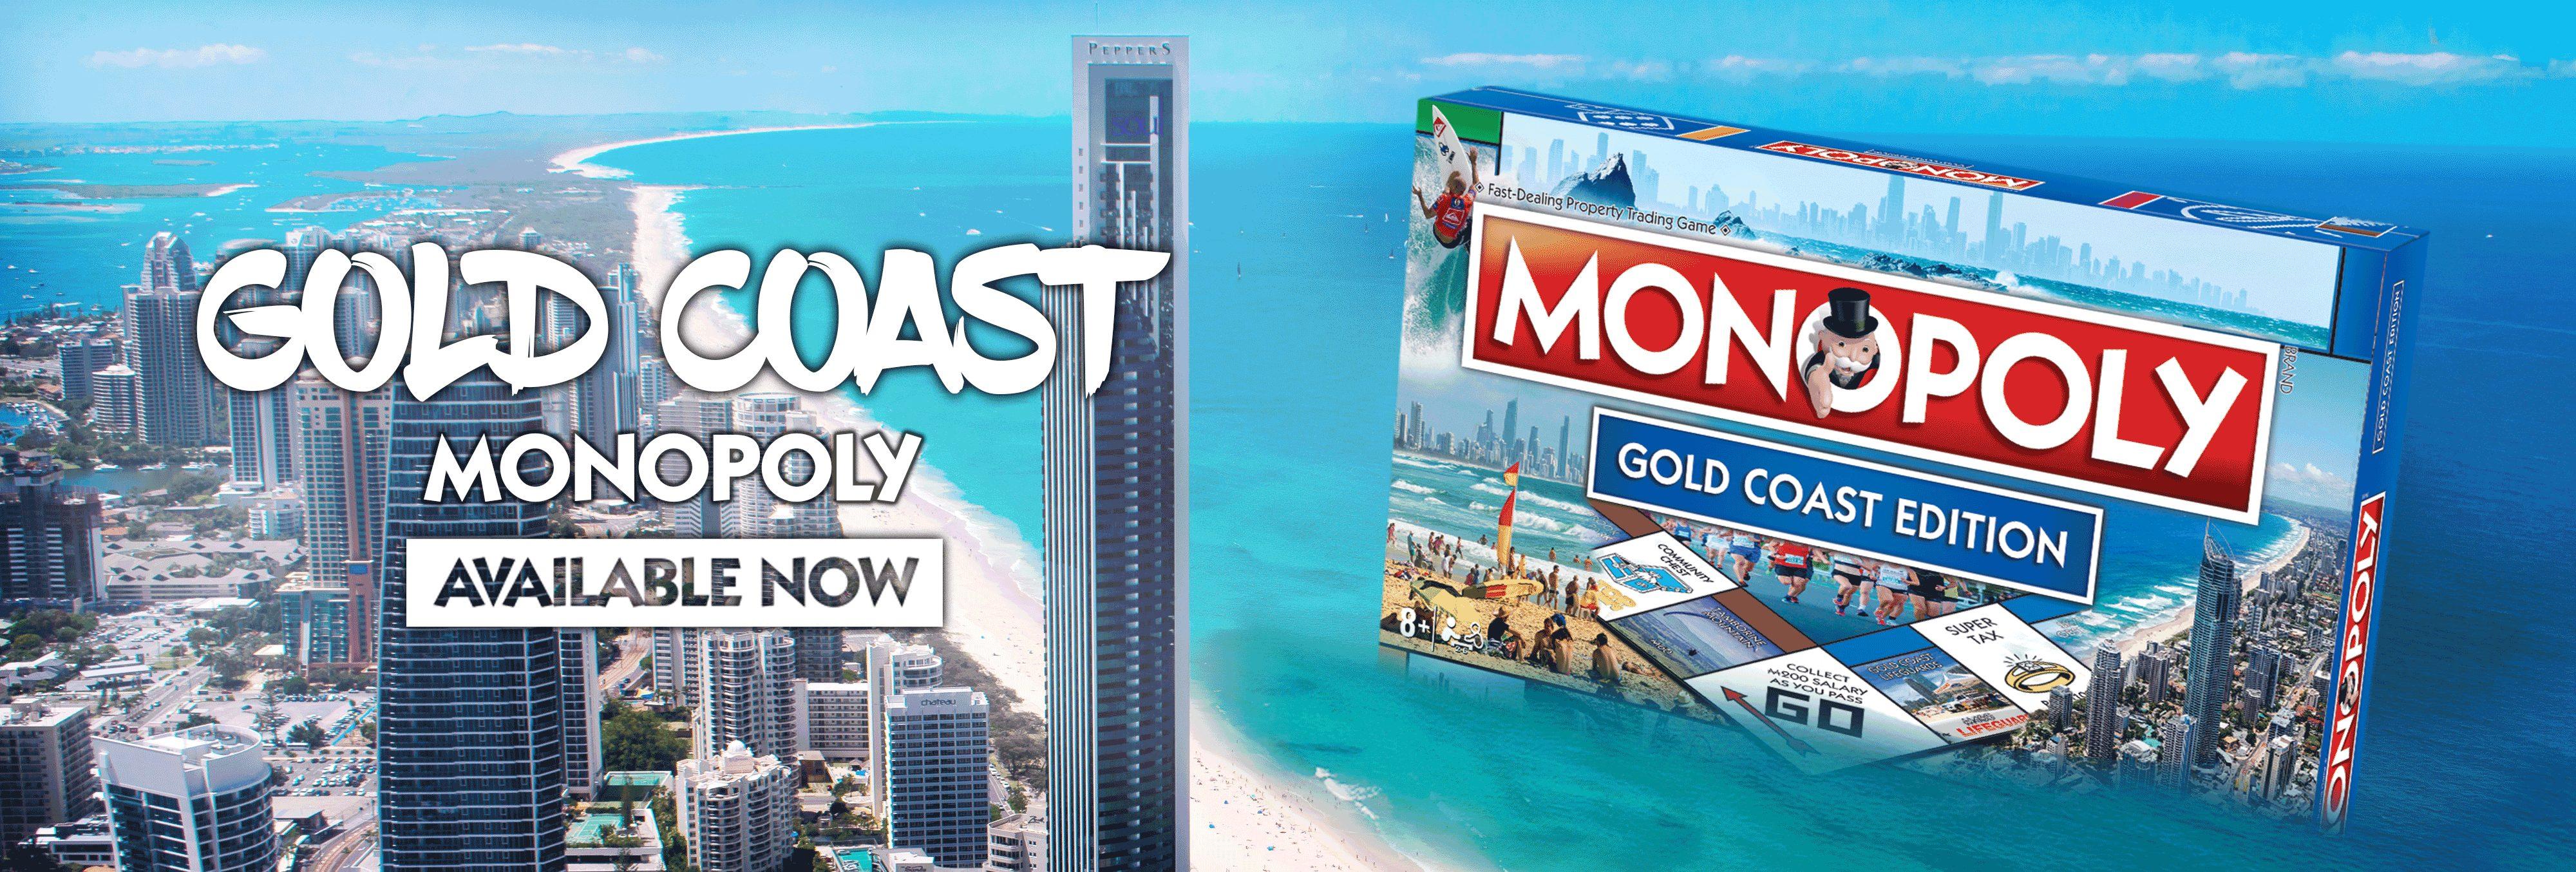 Gold Coast Monopoly